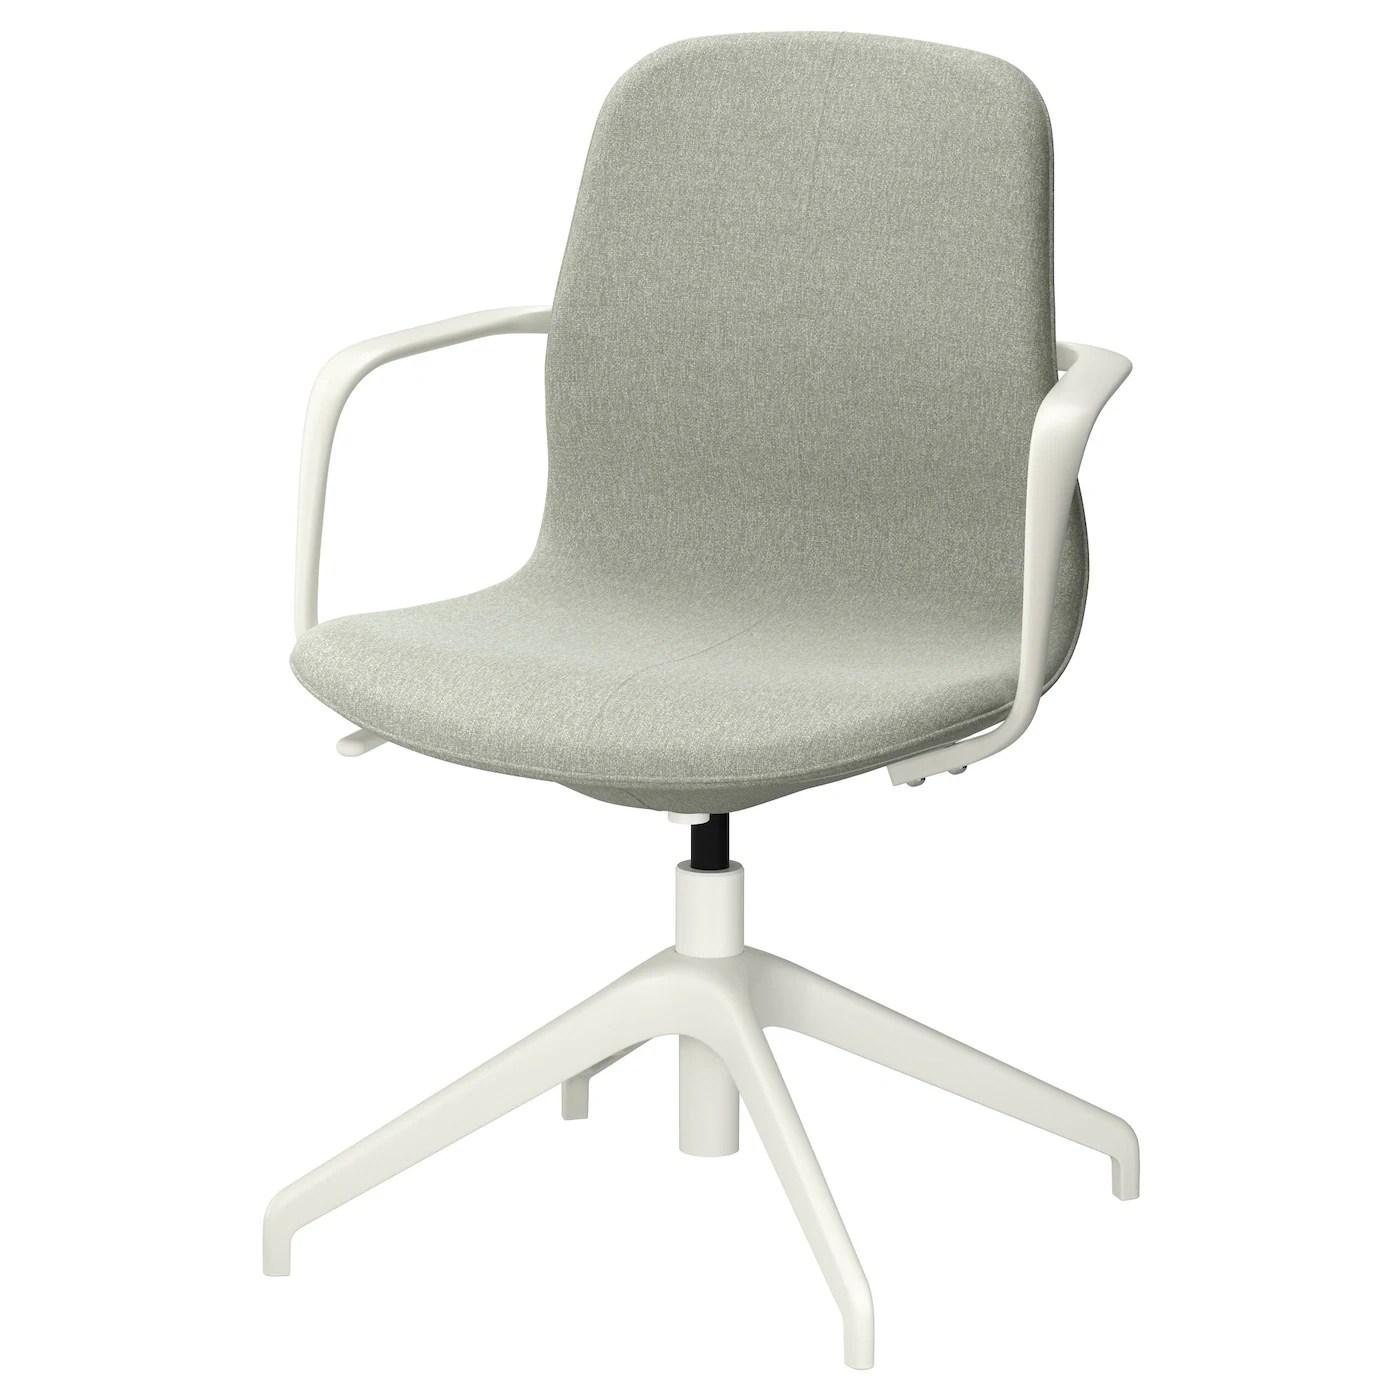 desk chair dublin fabric accent chairs office ikea ireland